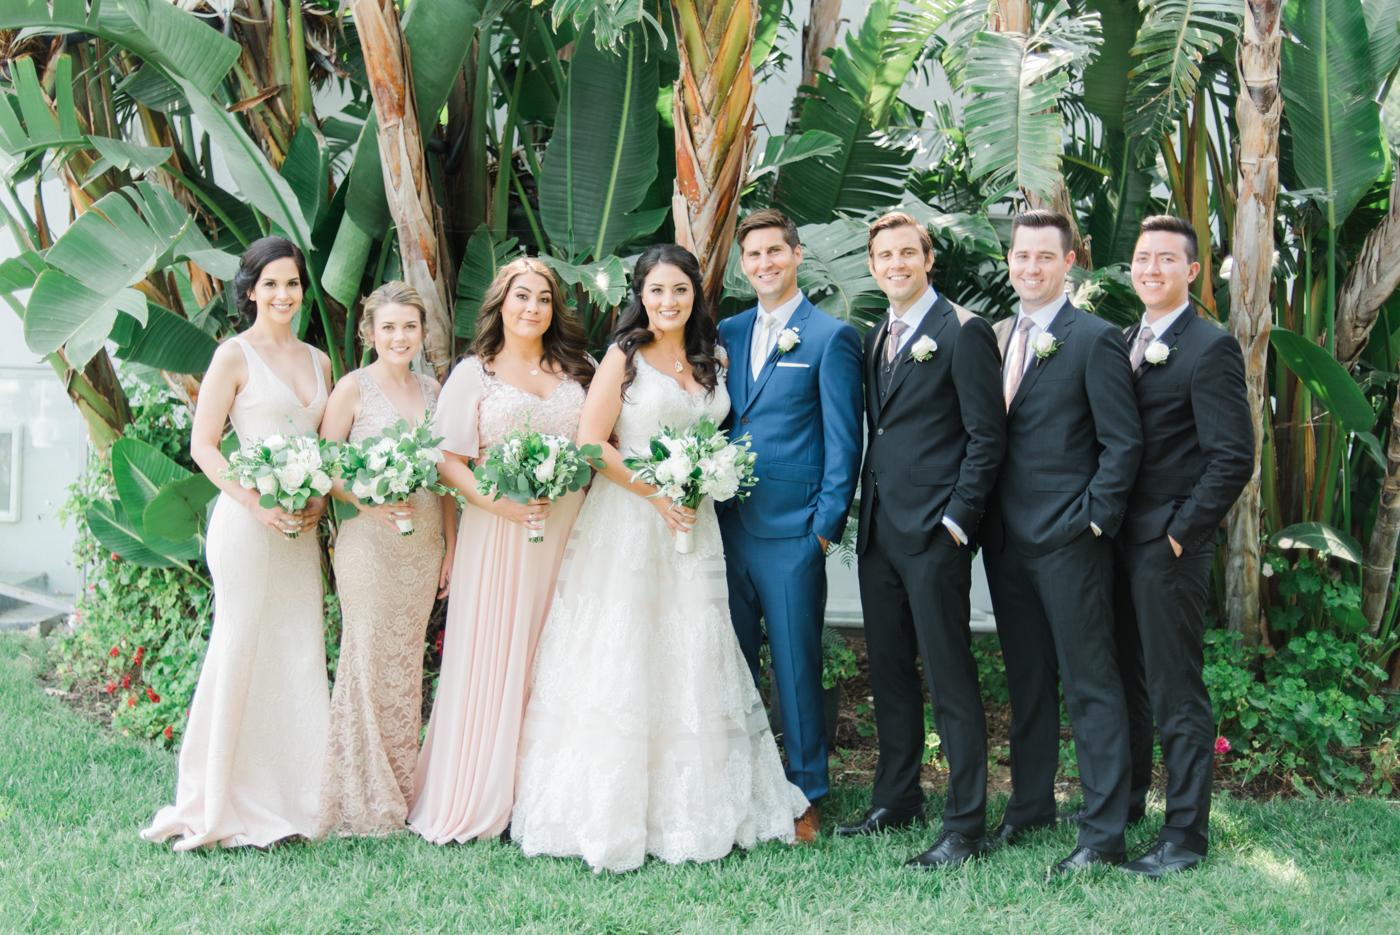 AKP_S&F_Malibu_Wedding_Fine_Art_Photography_Los_Angeles-8_bridal_party.jpg